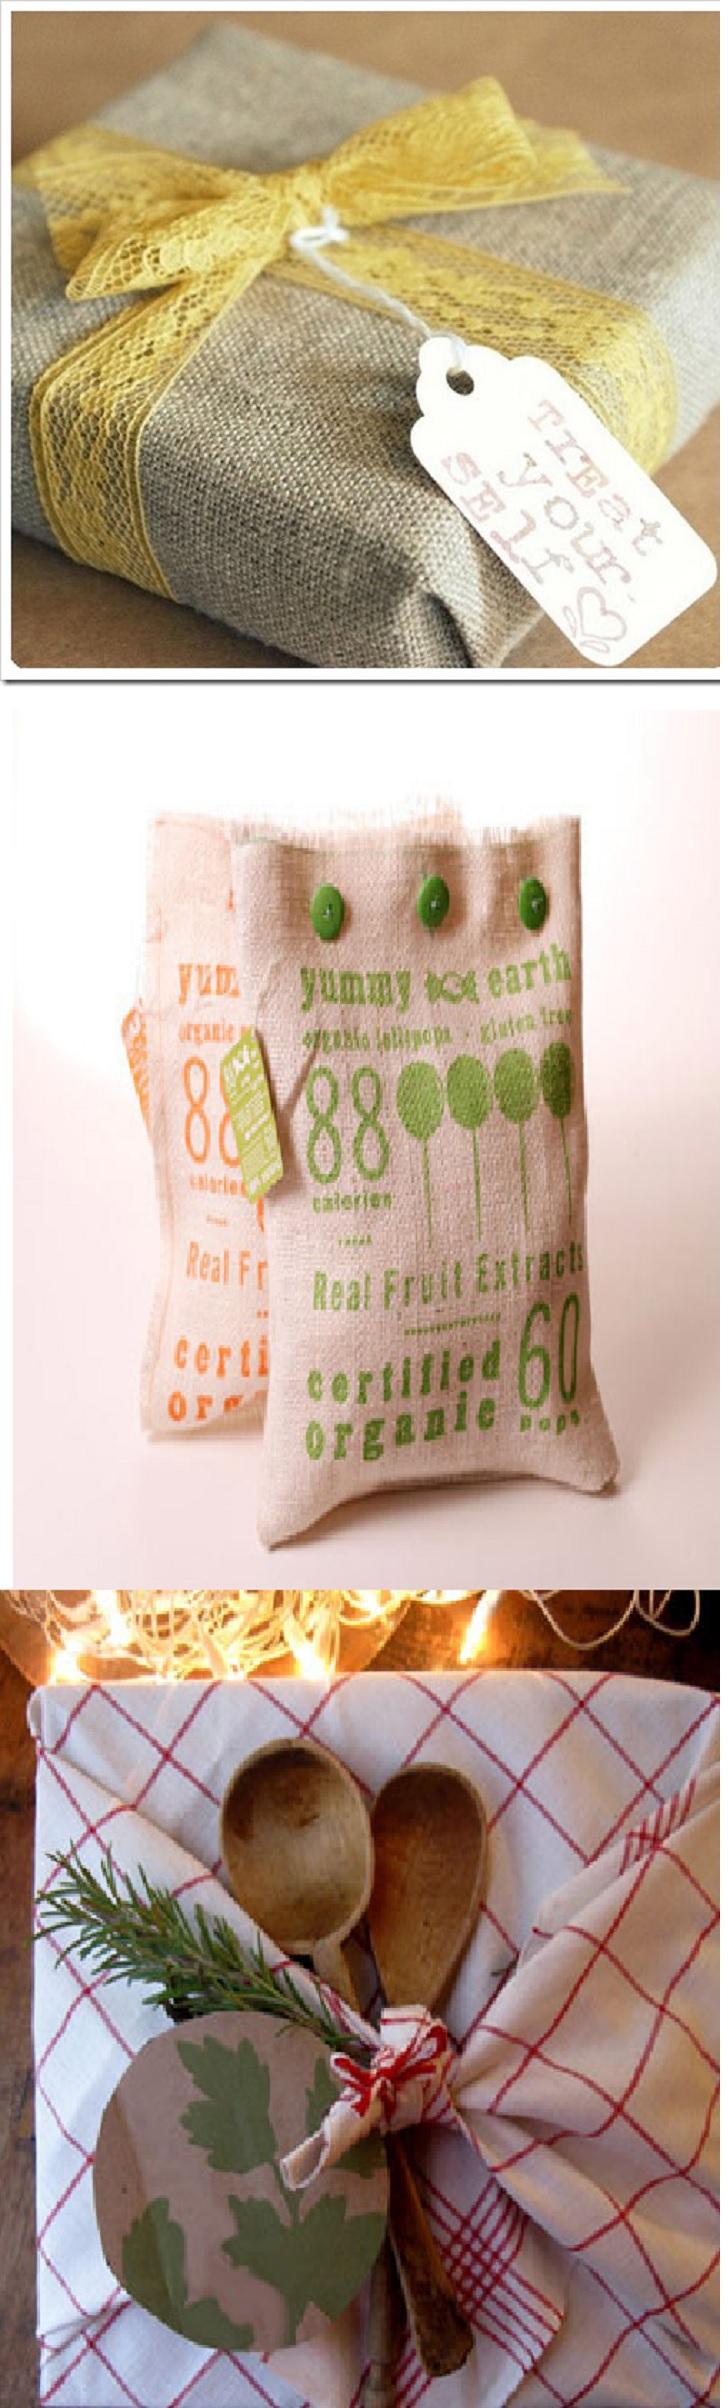 Варианты упаковки из ткани